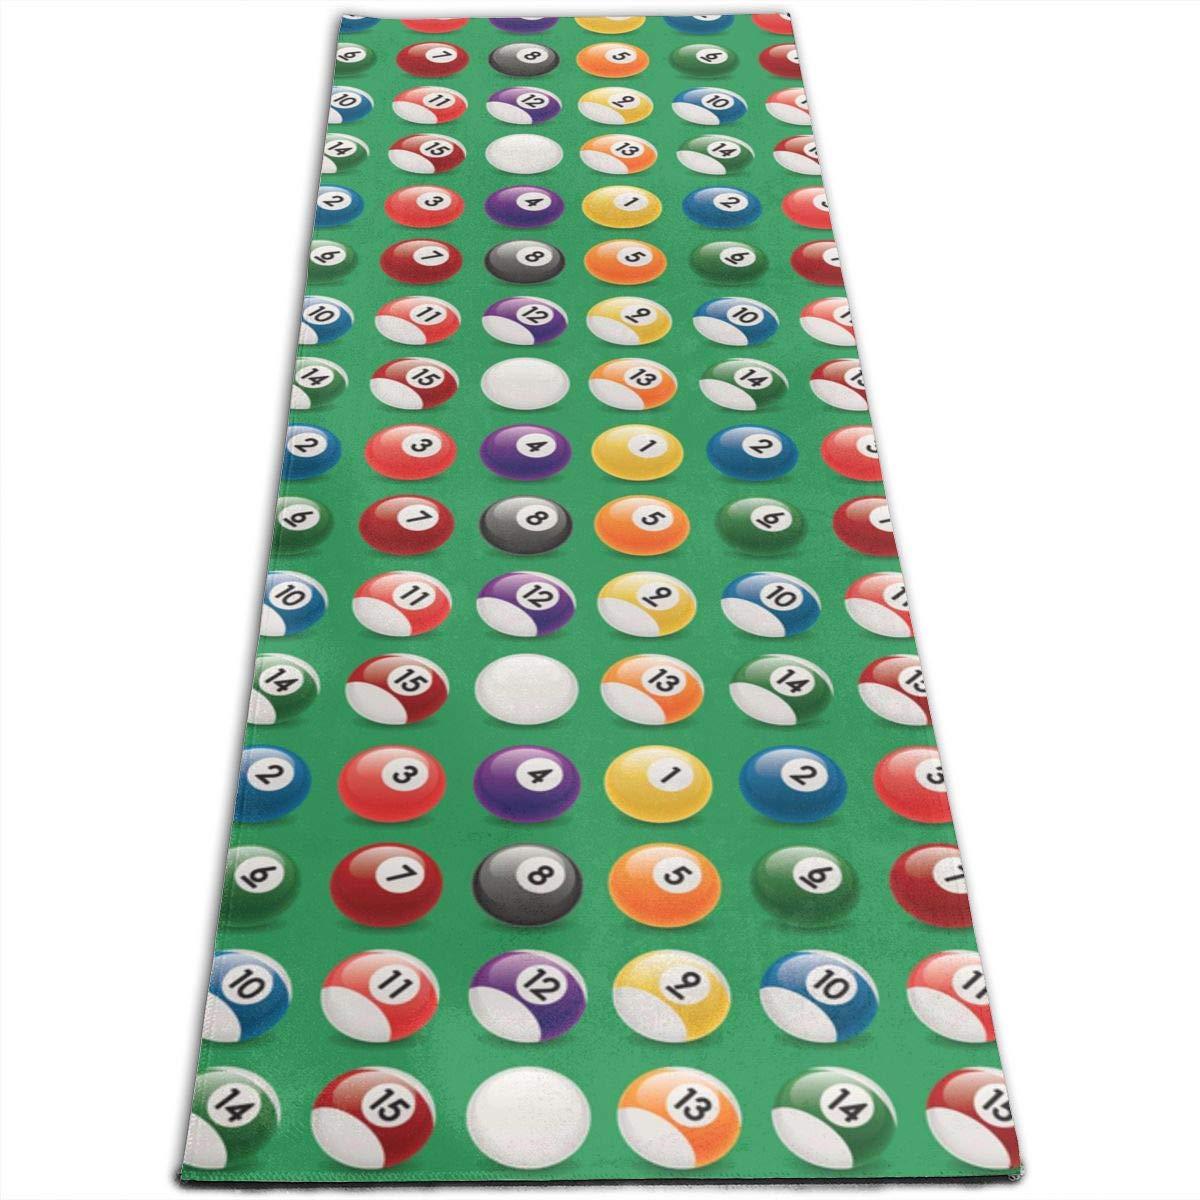 Amazon.com: Billiard Balls Colors Pattern Printed Yoga Mat ...